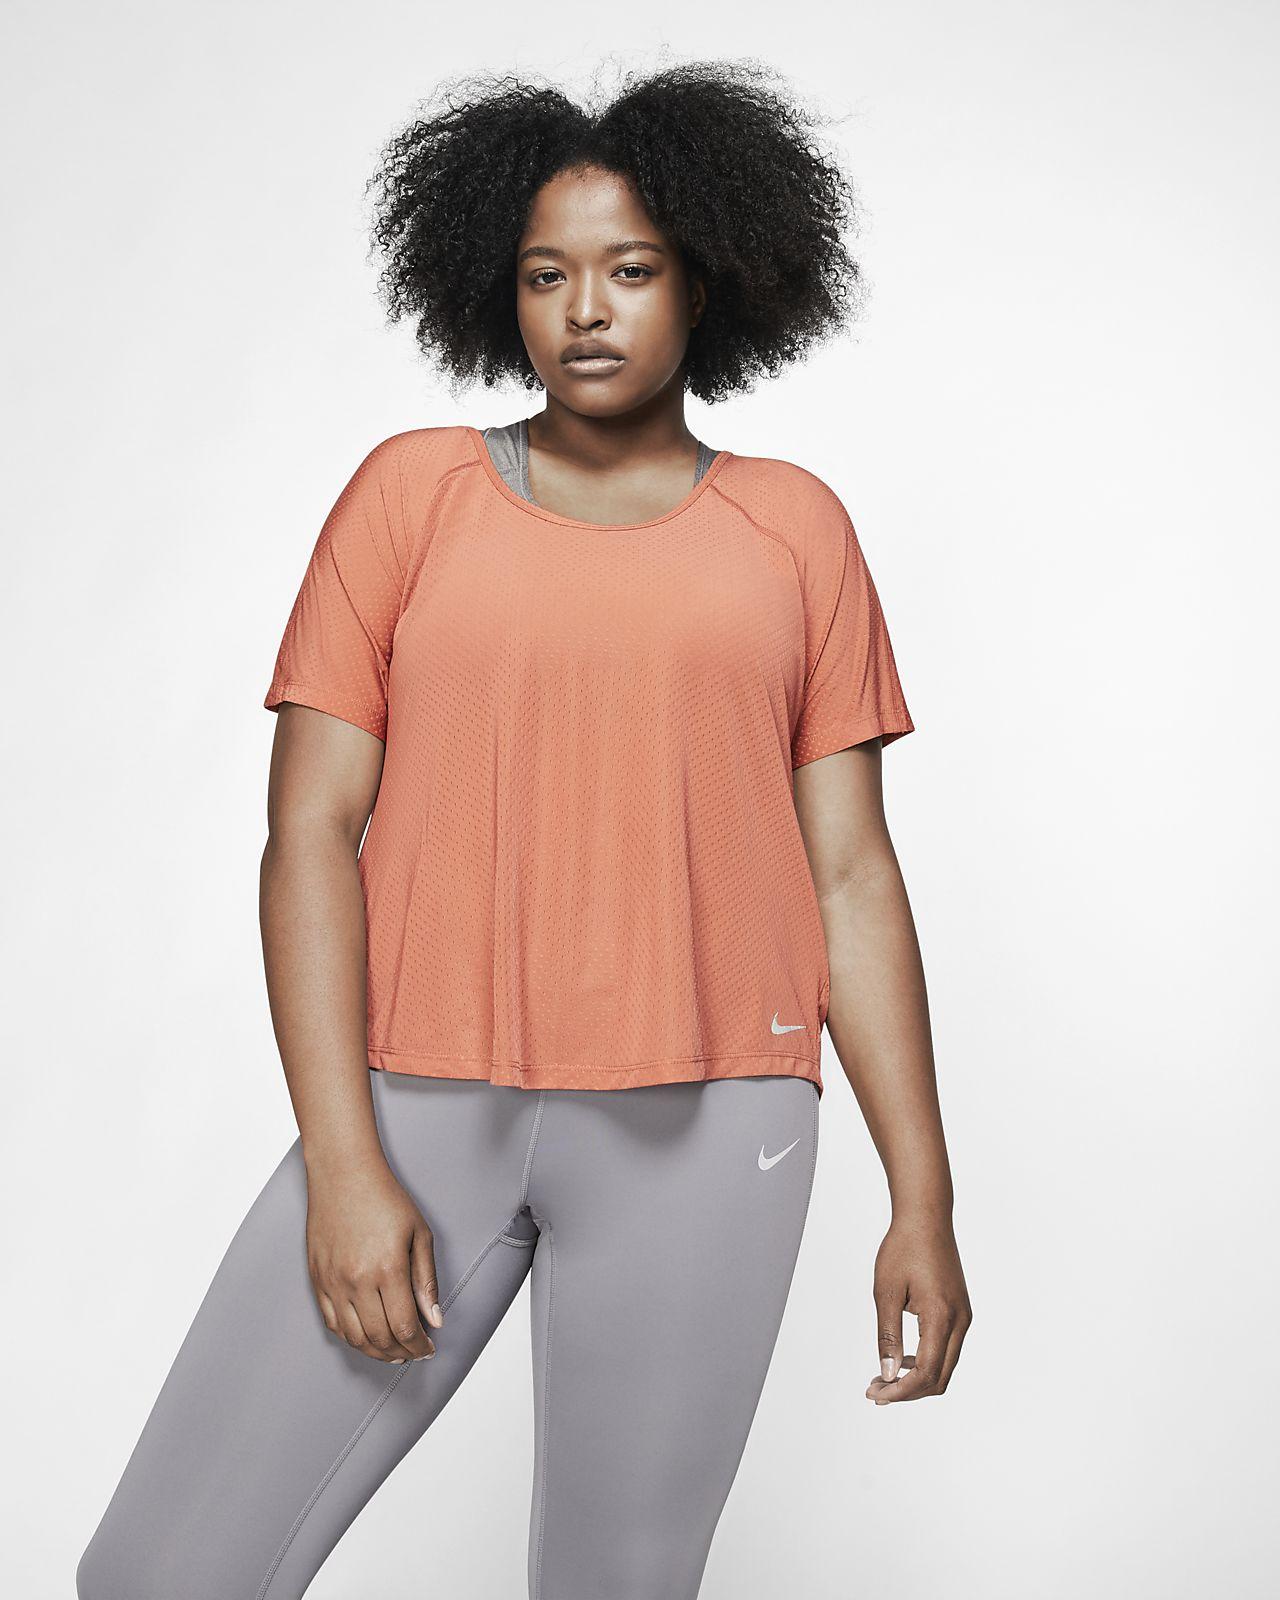 Löpartröja Nike Breathe Miler för kvinnor (Plus Size)